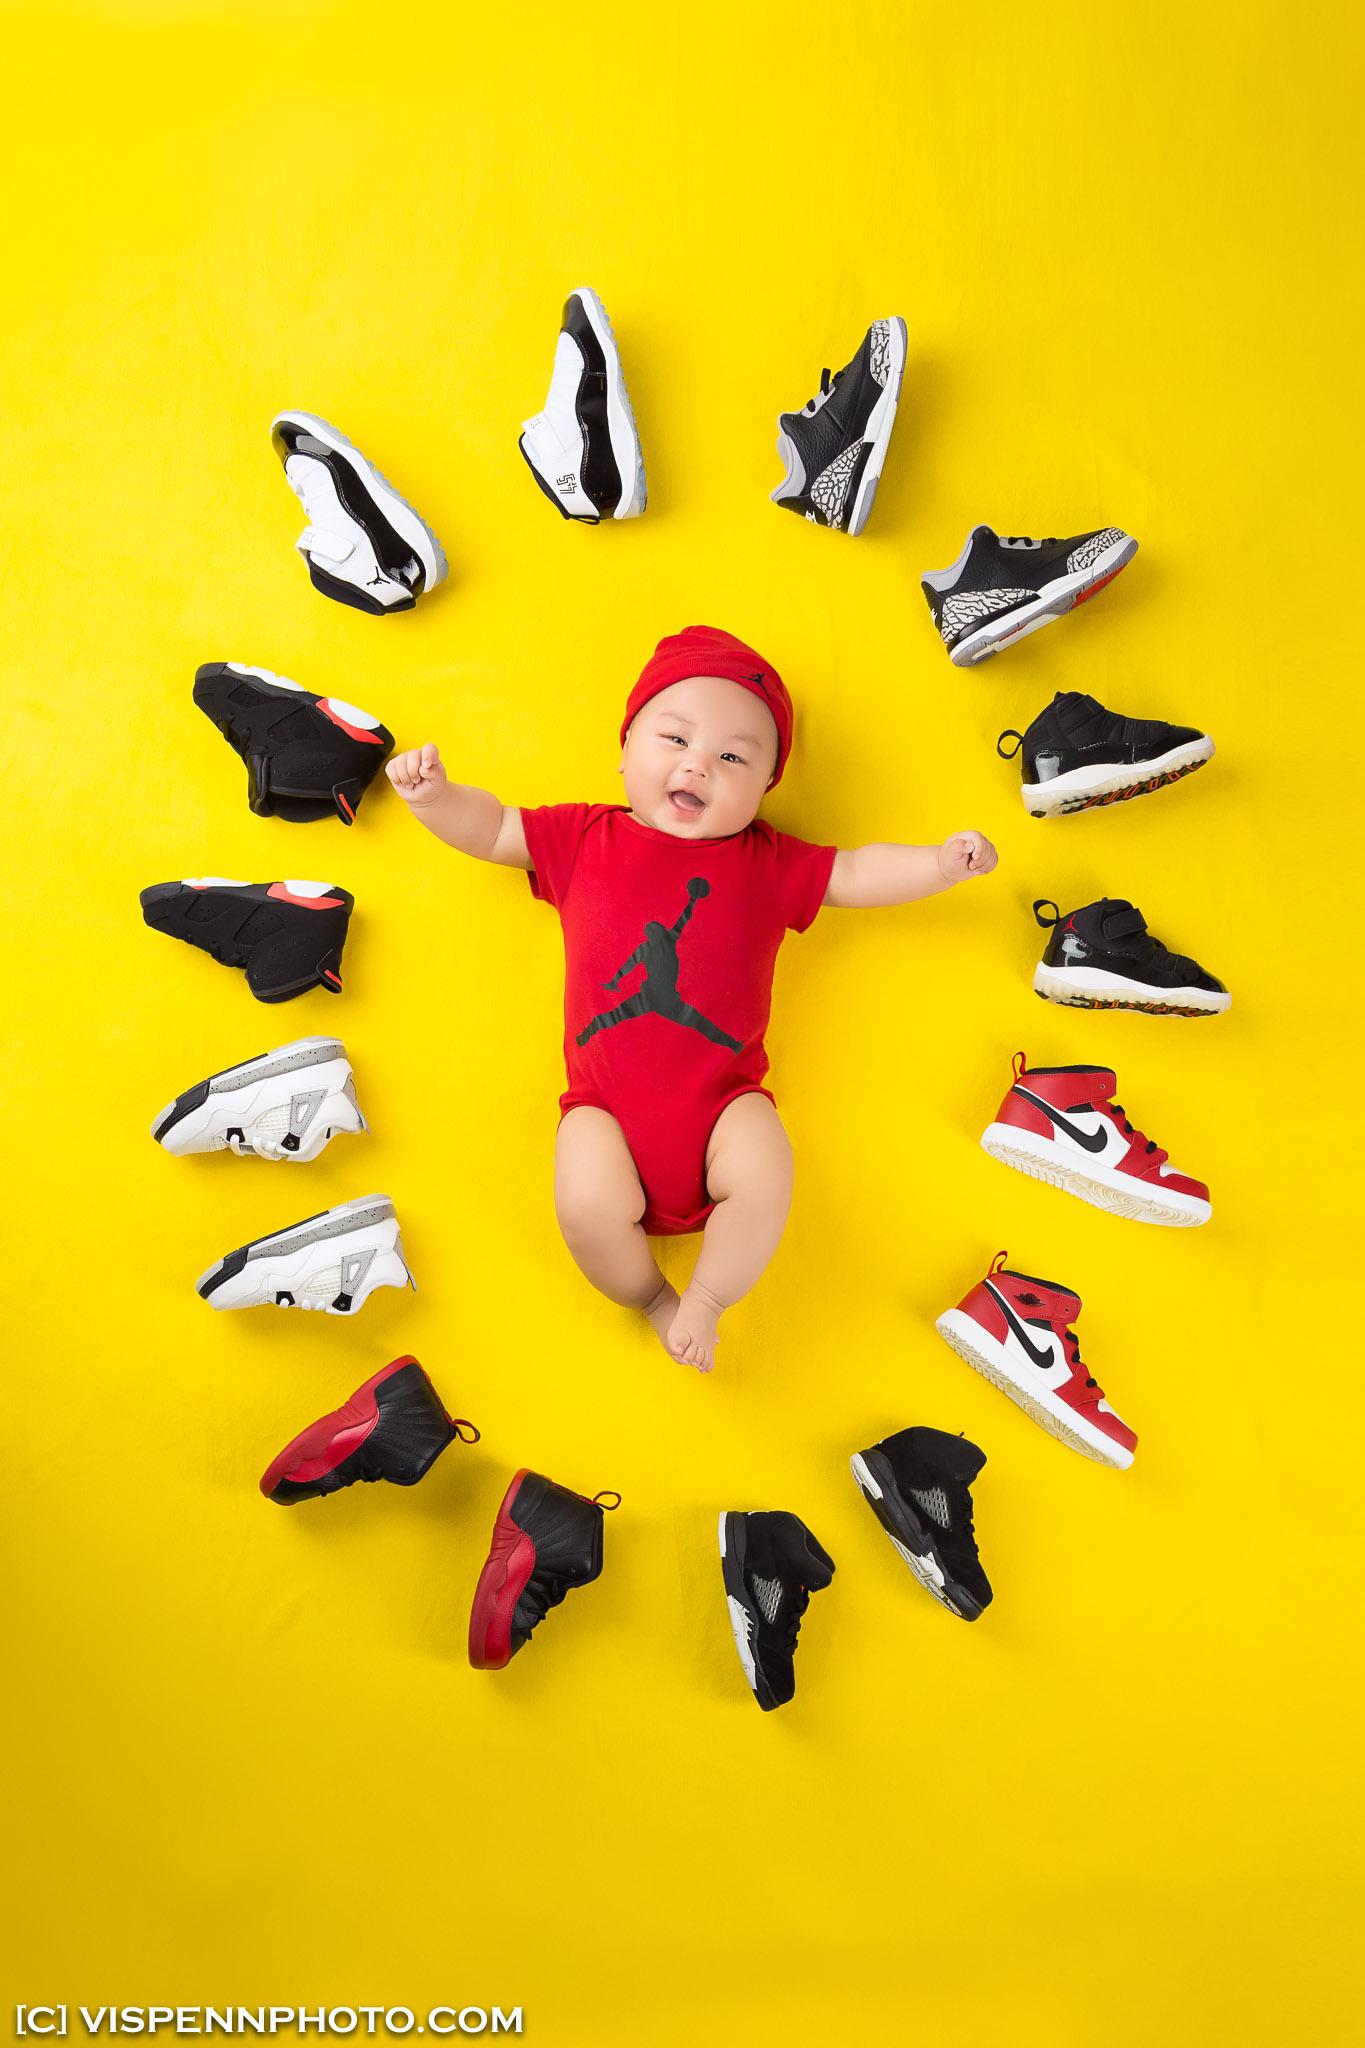 Melbourne Newborn Baby Family Photo BaoBao VISPENN 墨尔本 儿童 宝宝 百天照 满月照 孕妇照 全家福 100DAYS JessicaLIANG 1807 VISPENN